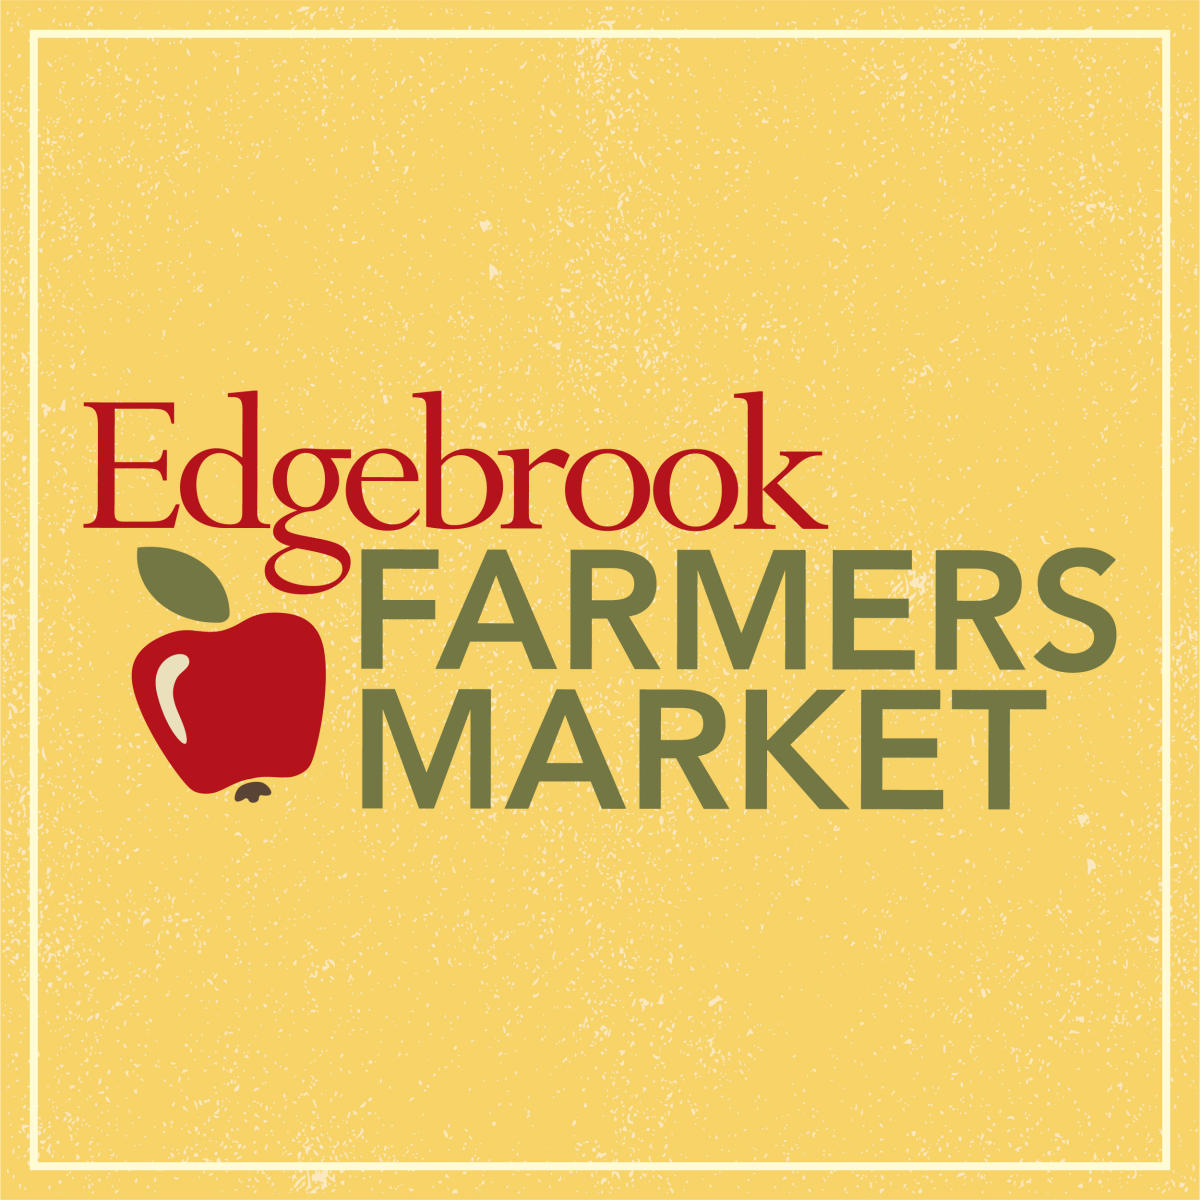 Edgebrook Farmers Market